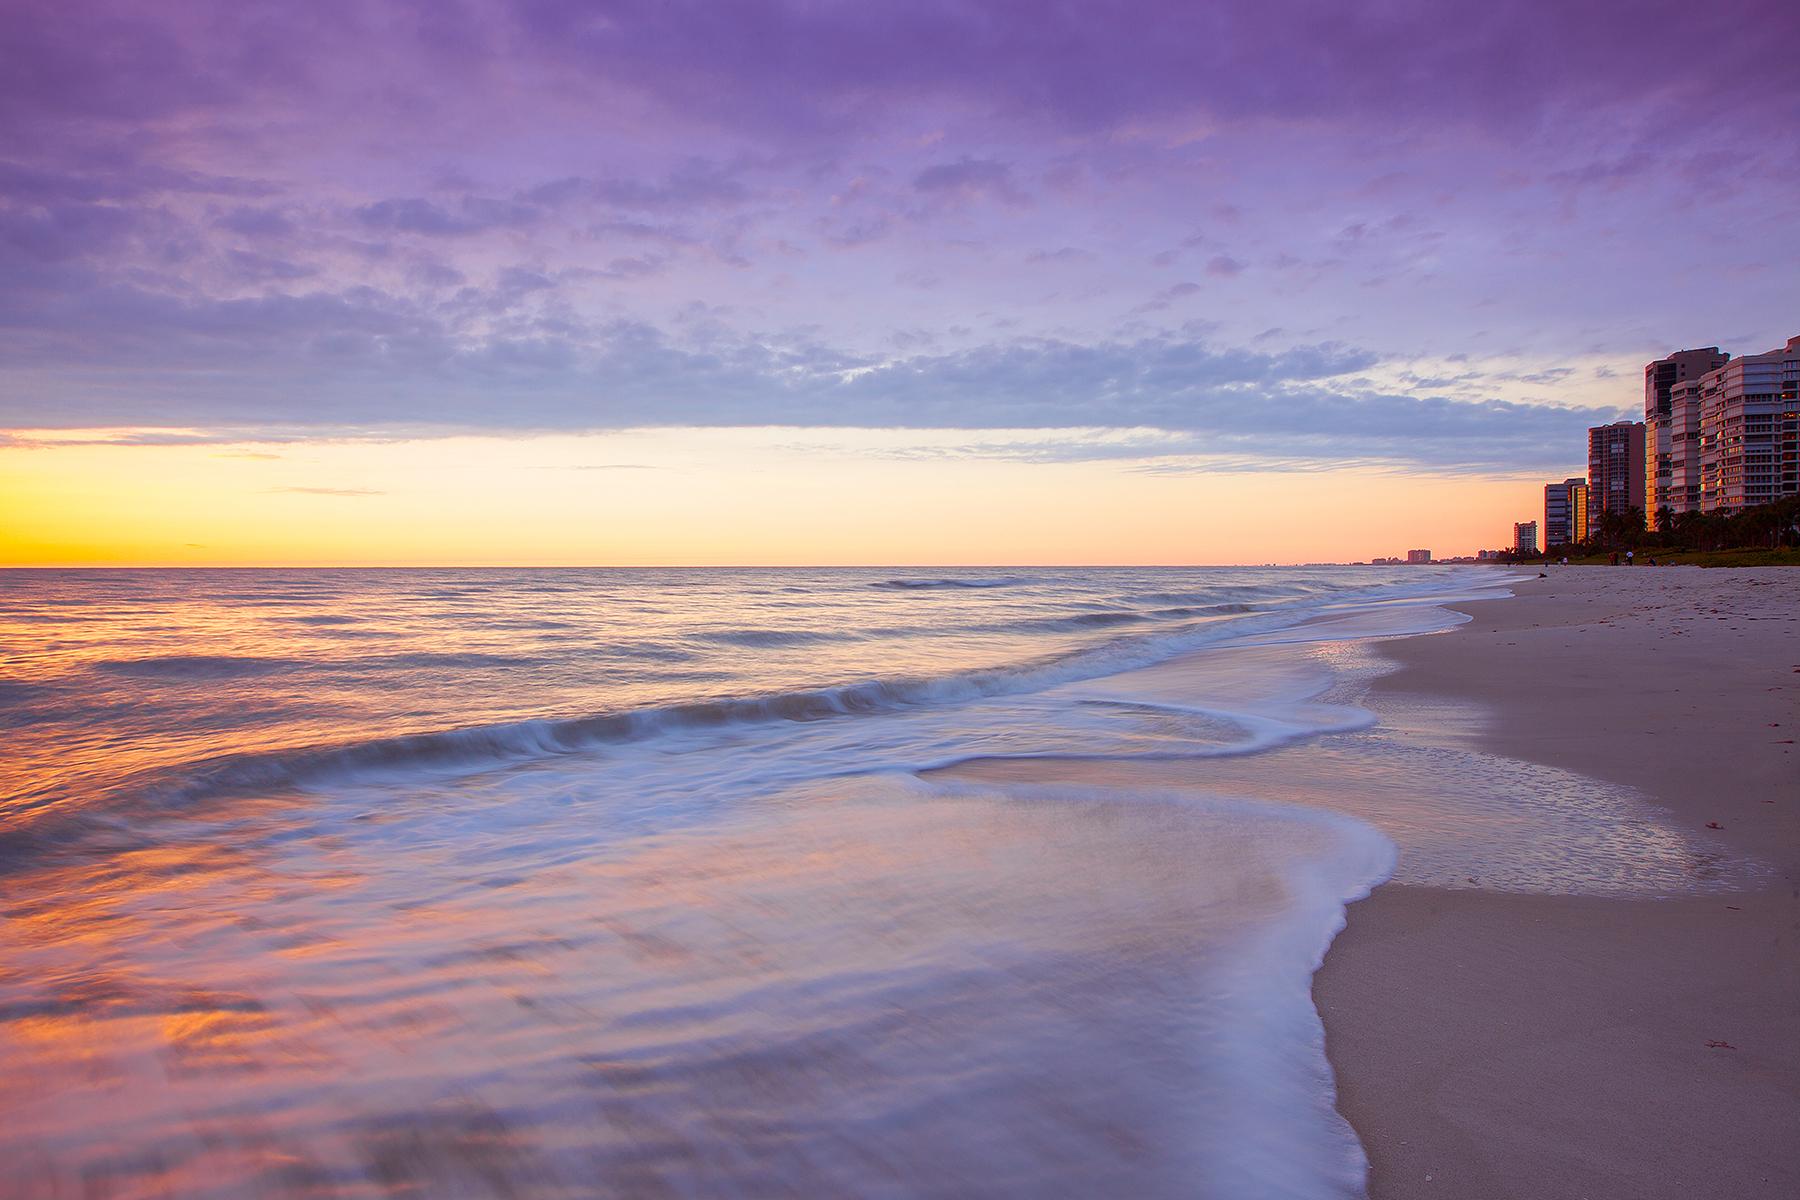 Condomínio para Venda às PARK SHORE - LA MER CONDO 4051 Gulf Shore Blvd N Unit 1405 Naples, Florida 34103 Estados Unidos